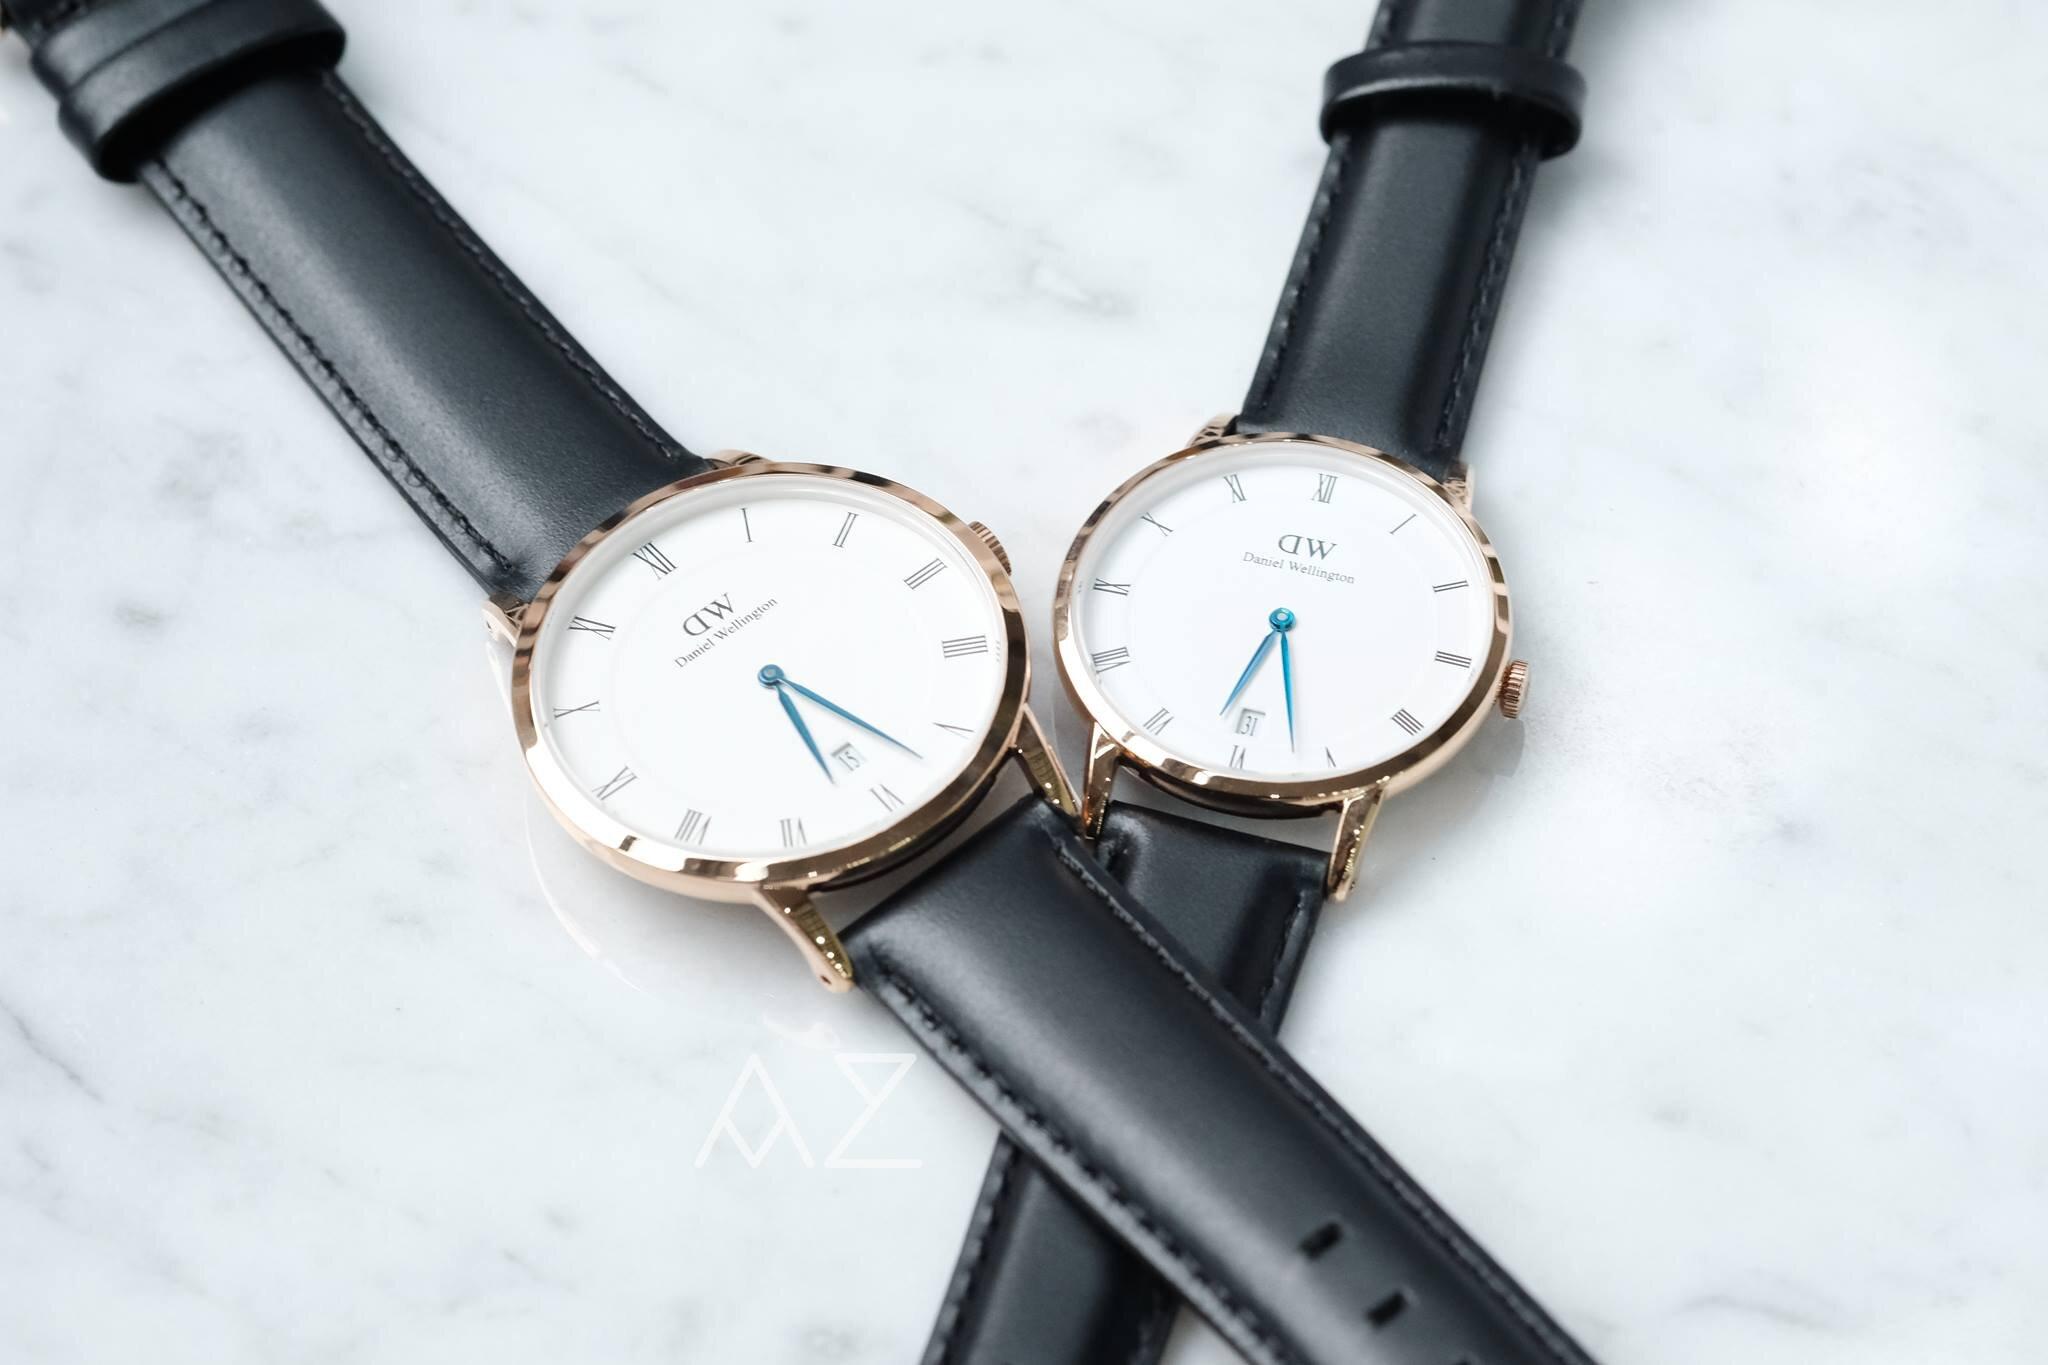 Đồng hồ Daniel Wellington giá bao nhiêu?